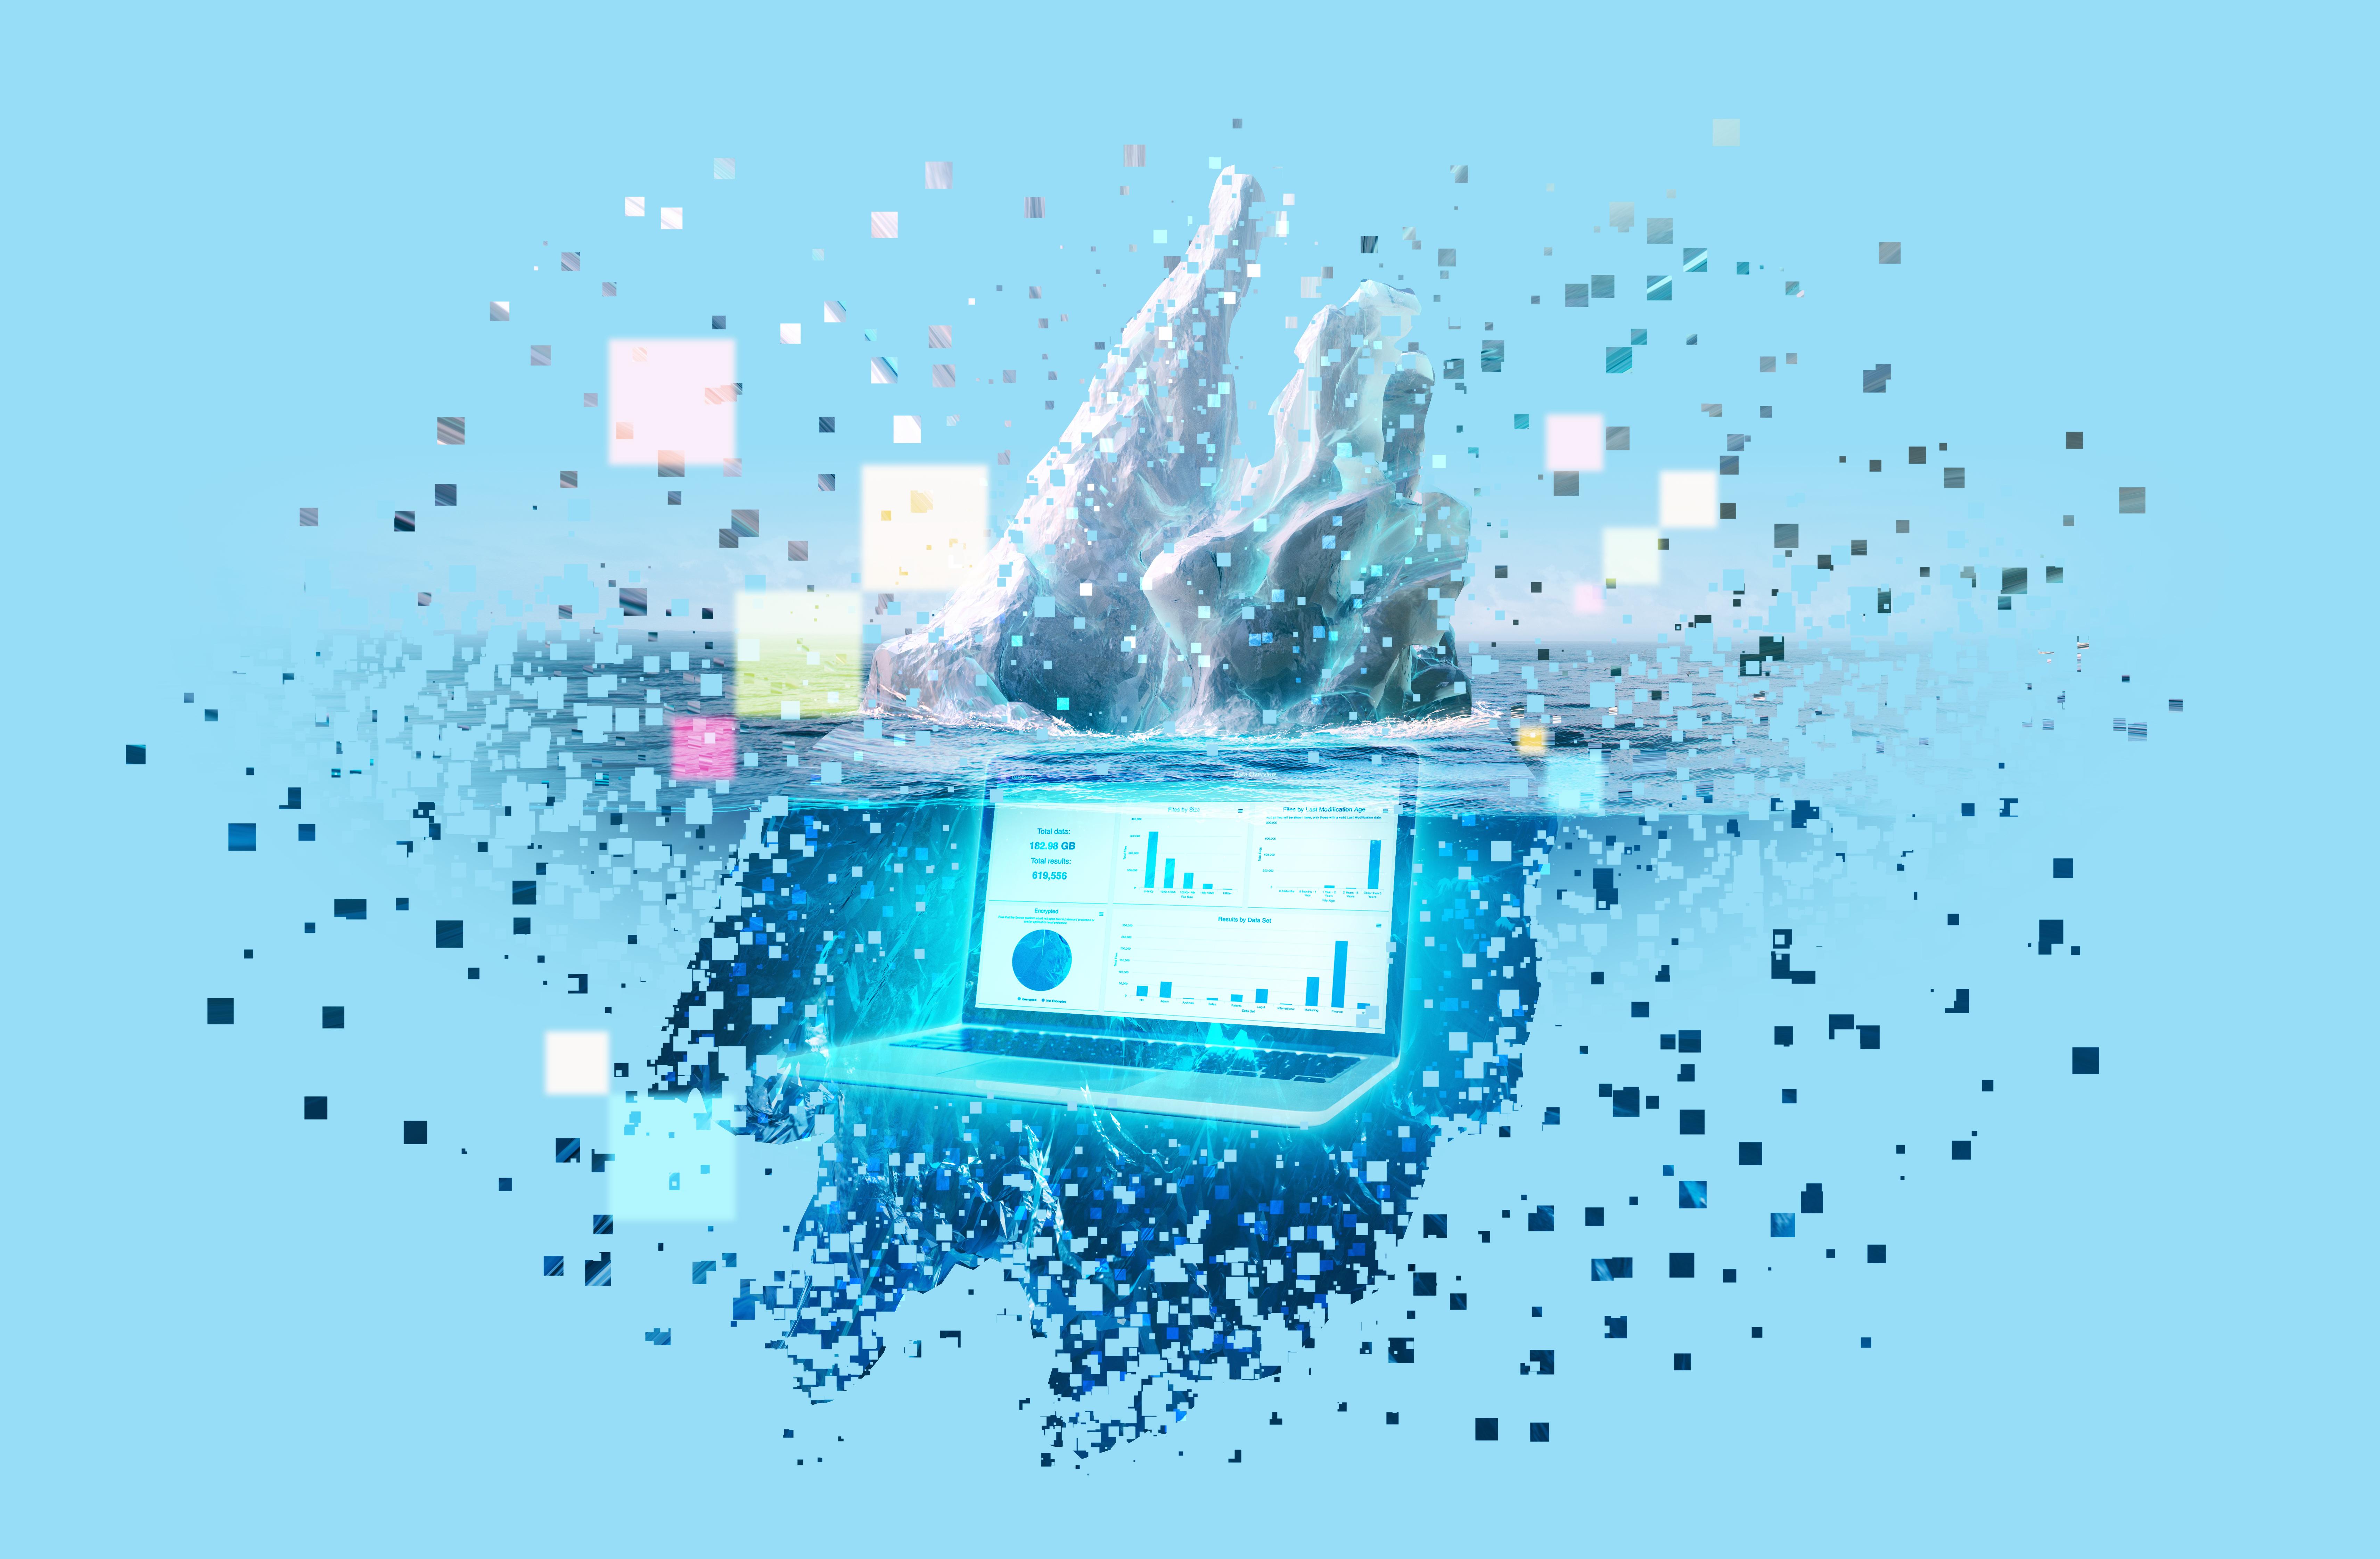 Iceberg - Corporate Knowledge